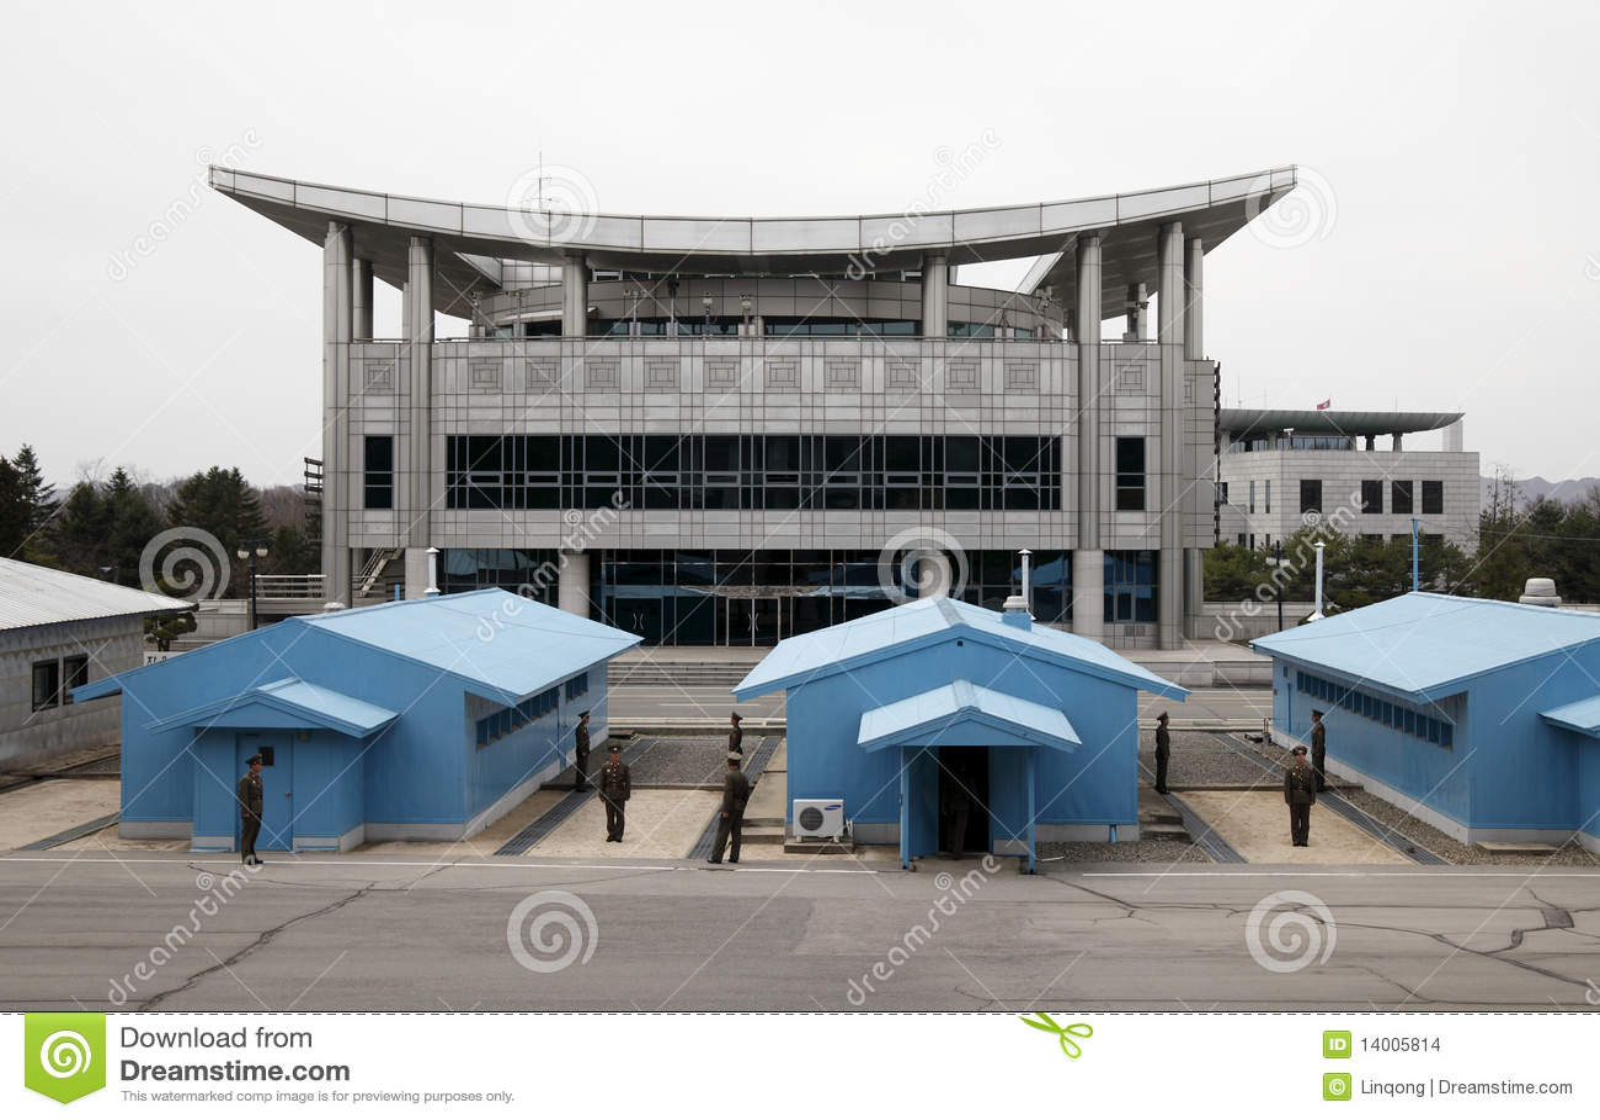 North korea 2010